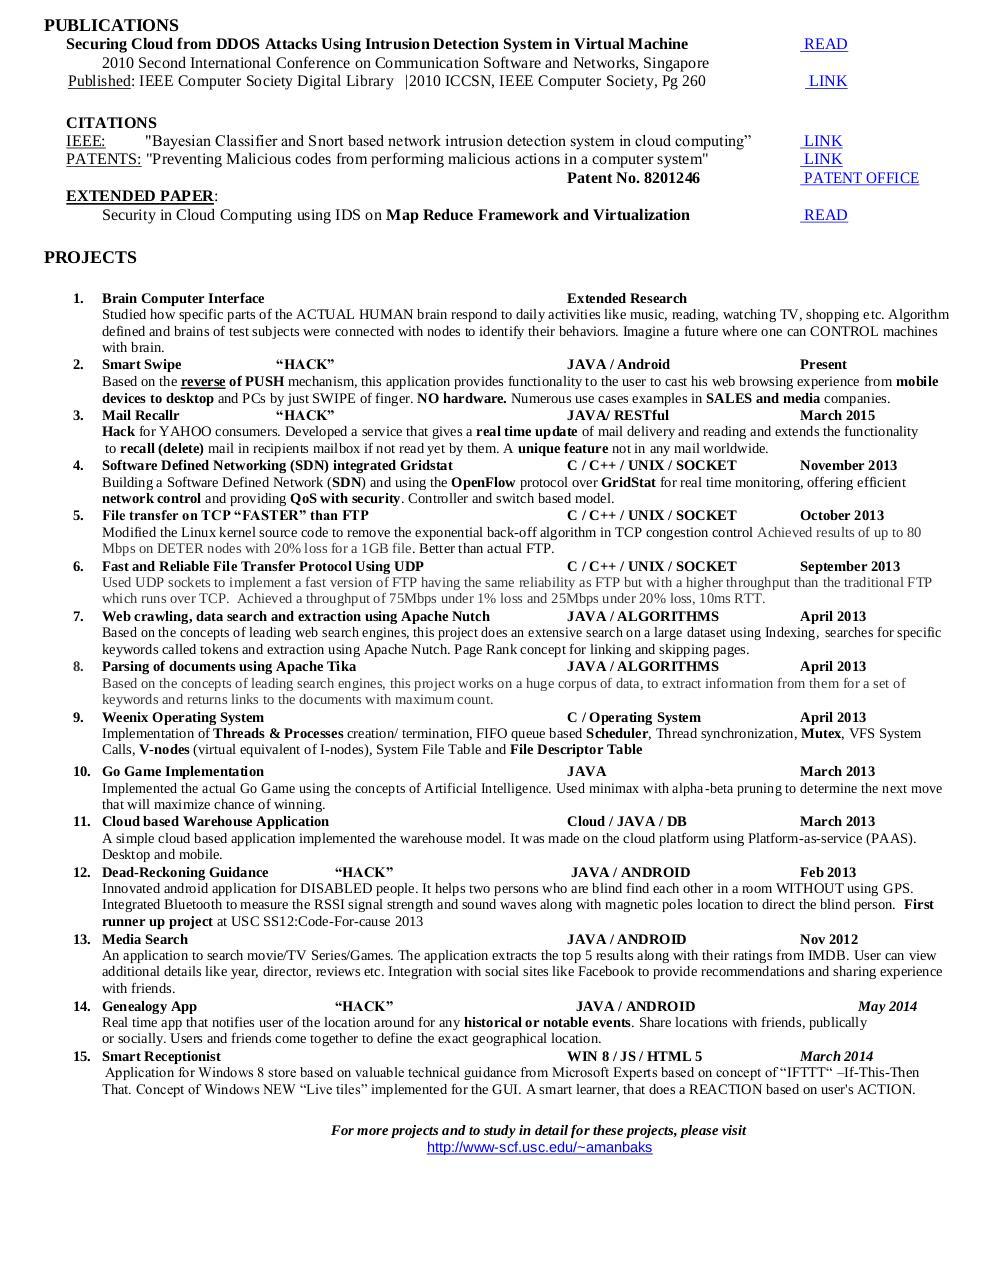 Resume Aman Bakshi by Aman Bakshi - PDF Archive